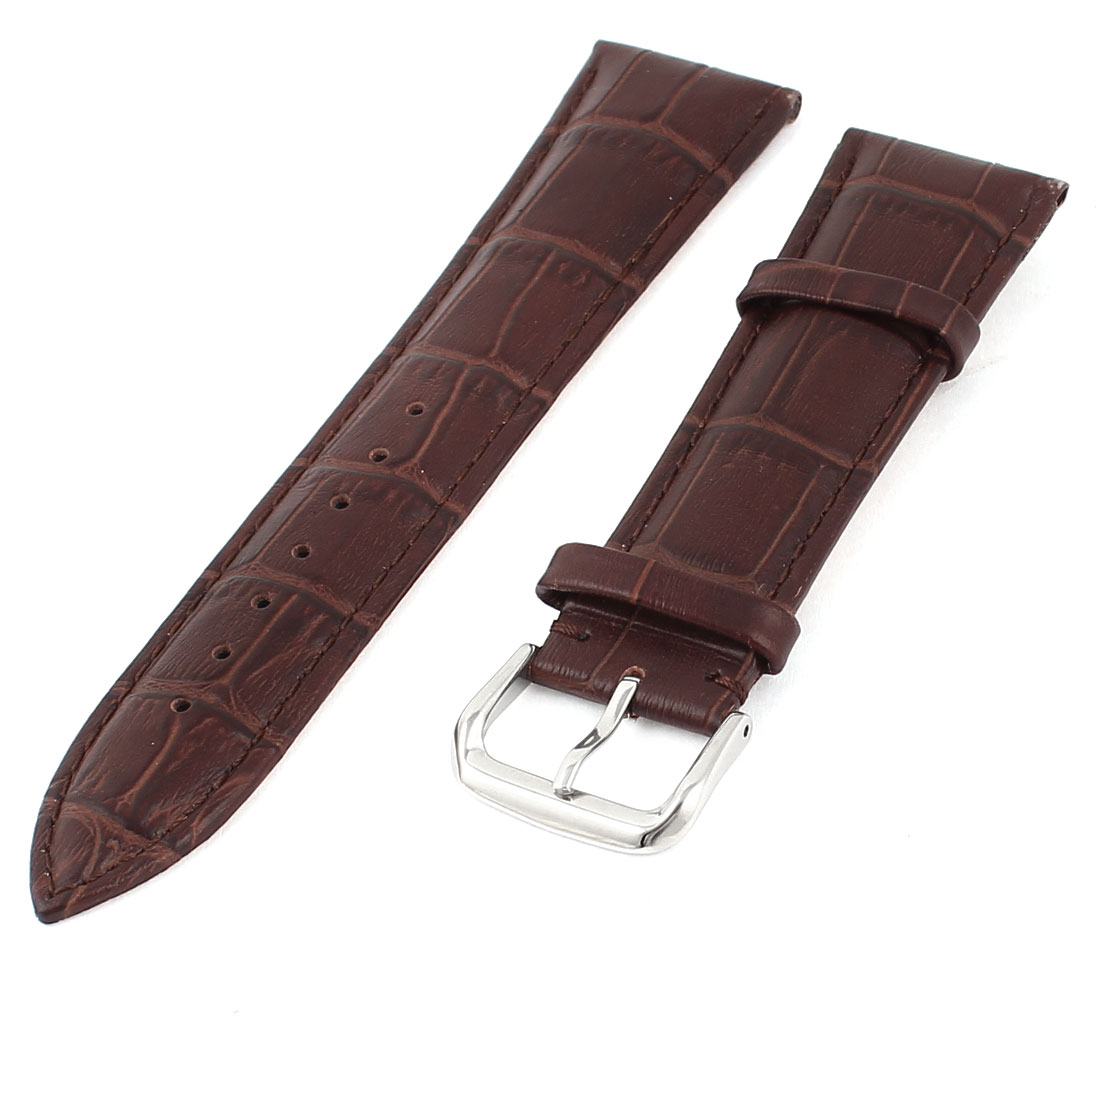 Faux Leather Adjustable Watch Band Belt Bracelet Strap Brown 24mm Width